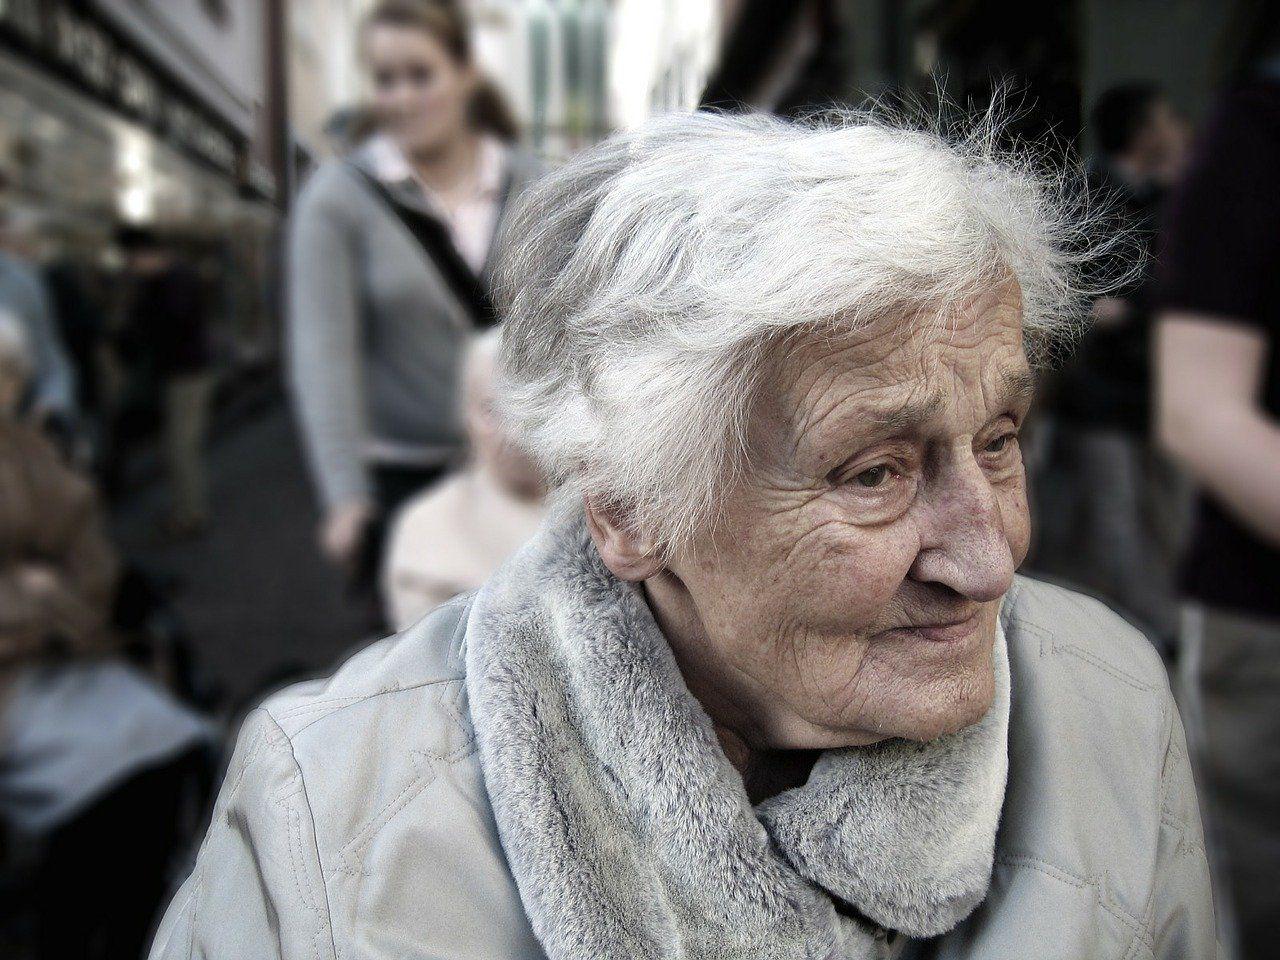 woman-old_cn202010.jpg